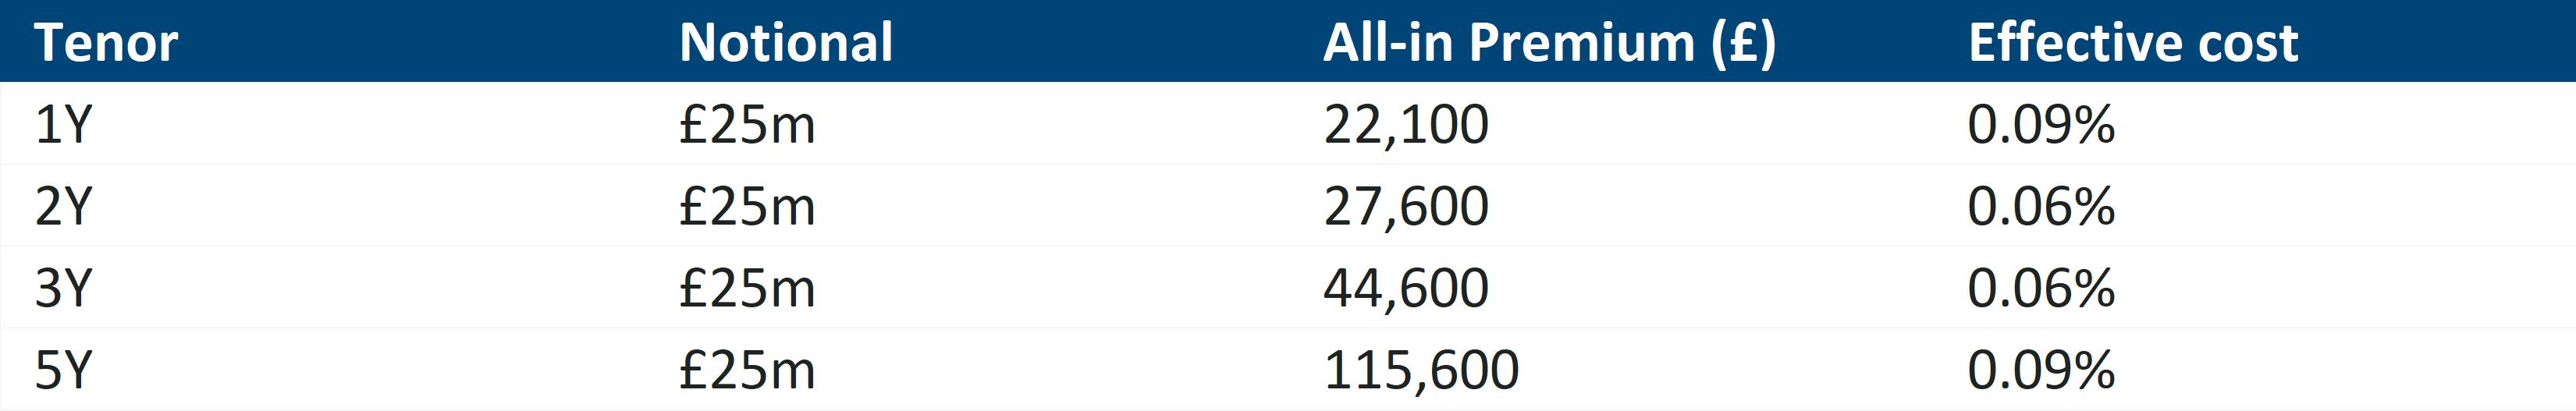 LIBOR floor pricing